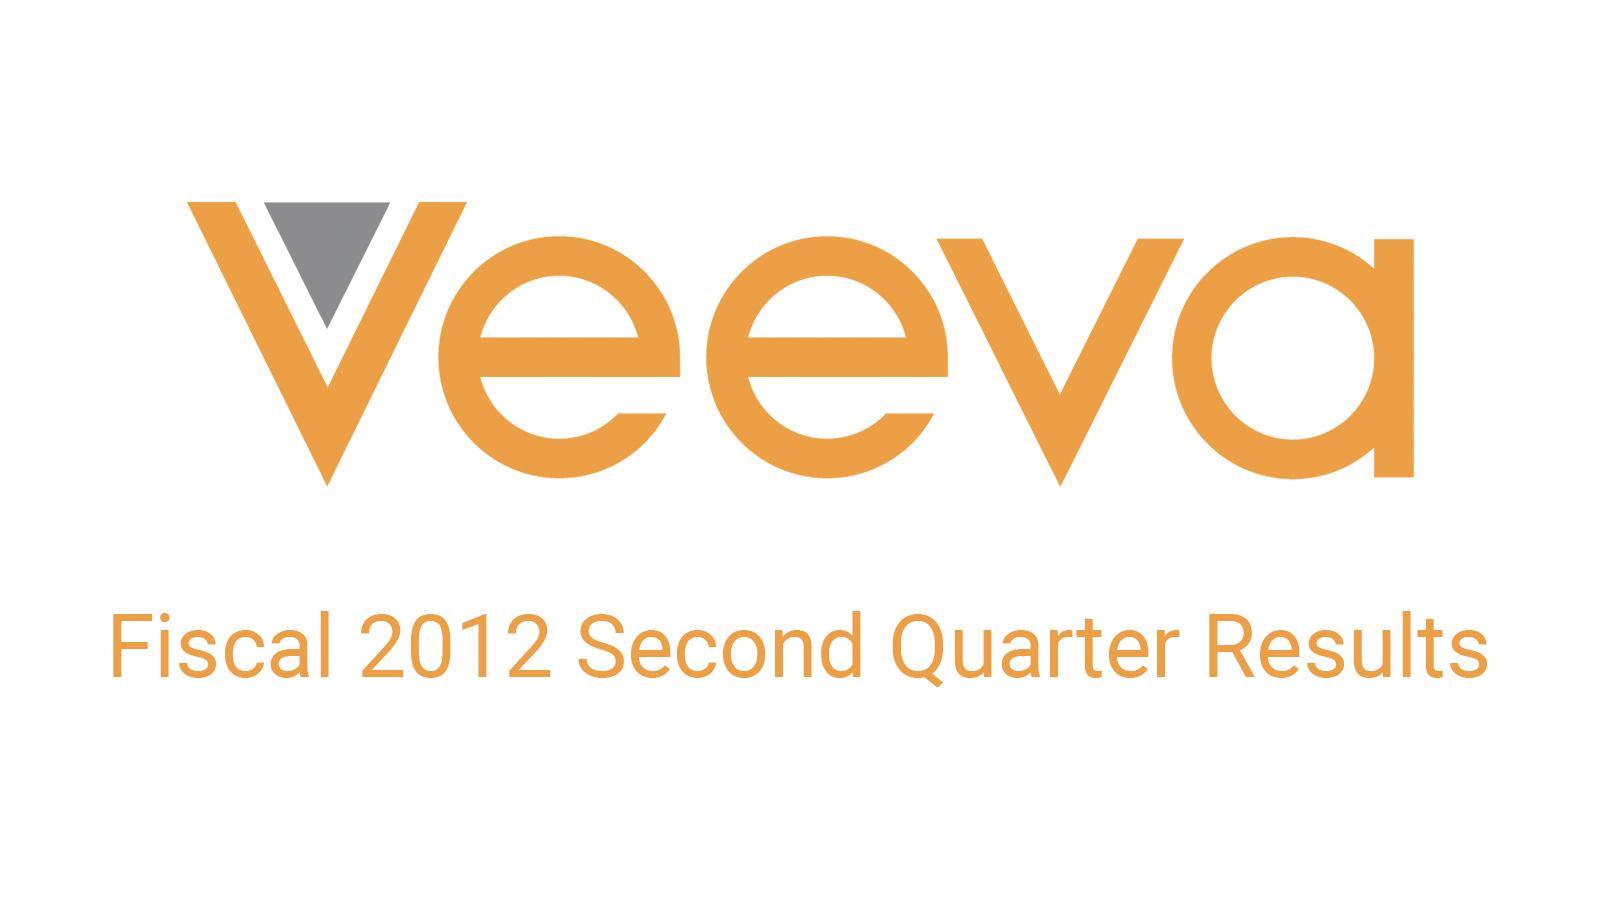 Veeva Announces Fiscal 2021 Second Quarter Results